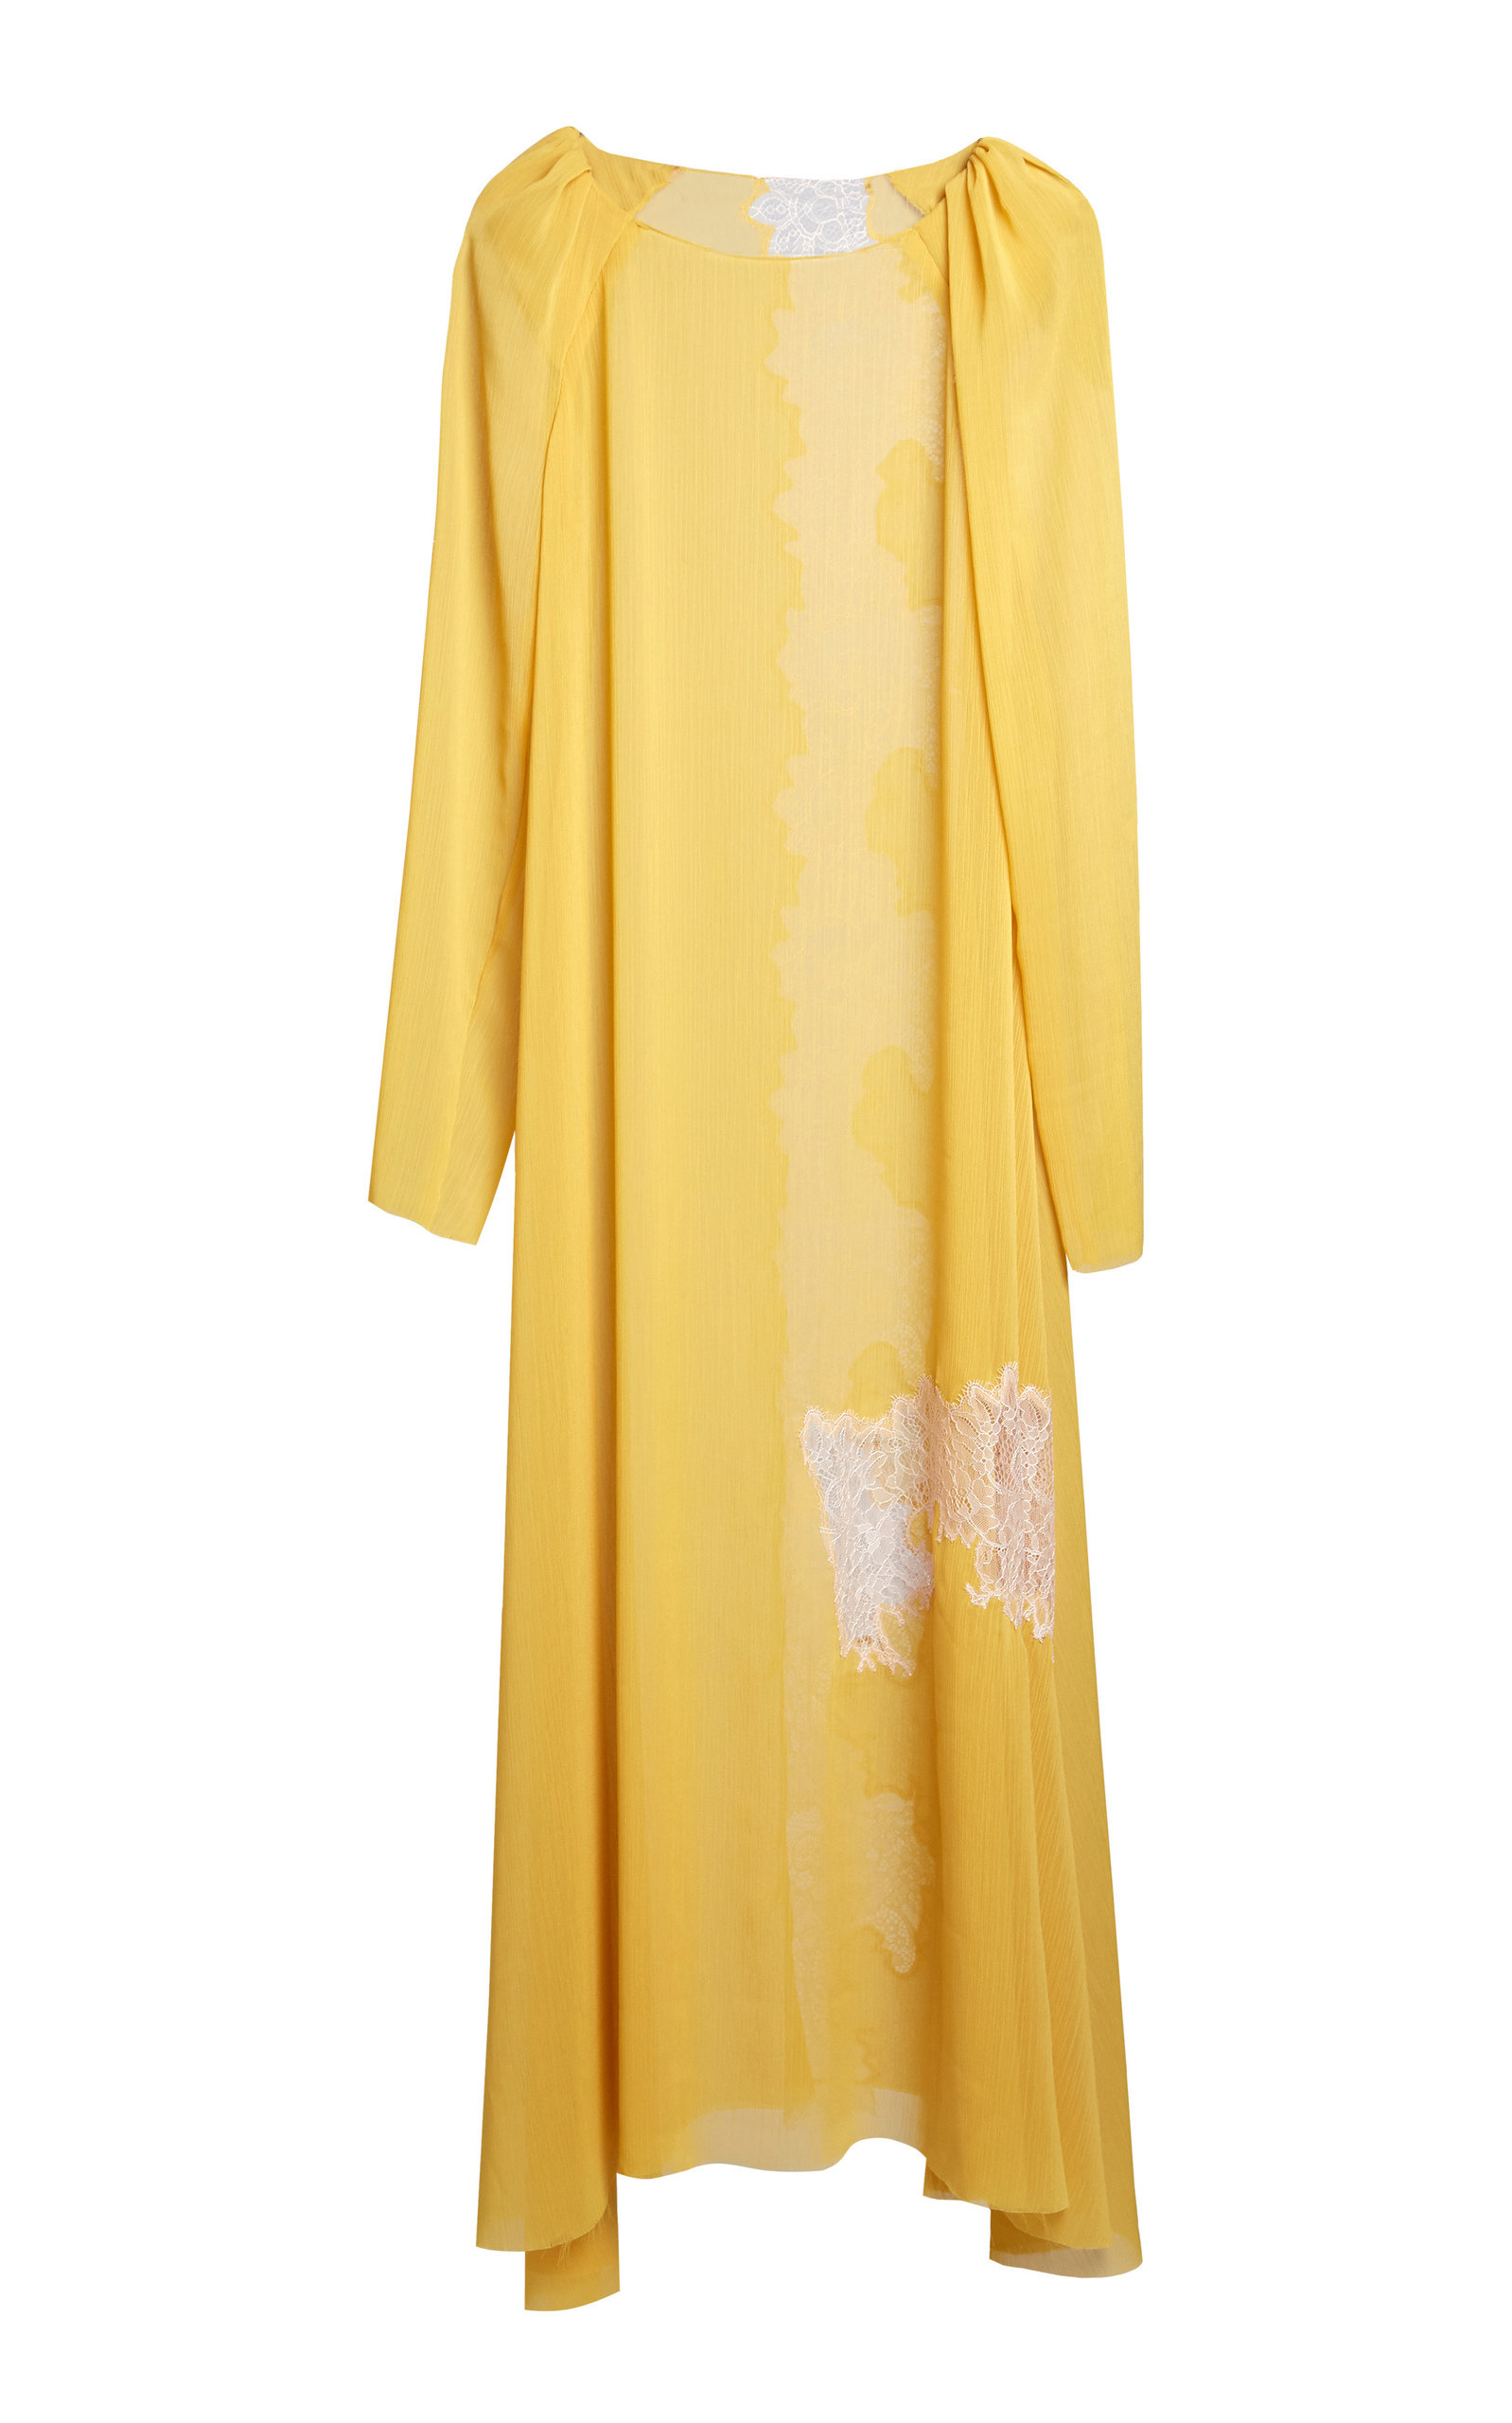 Lake Studio LACE-PANELED GAUZE MAXI SHIFT DRESS SIZE: 42